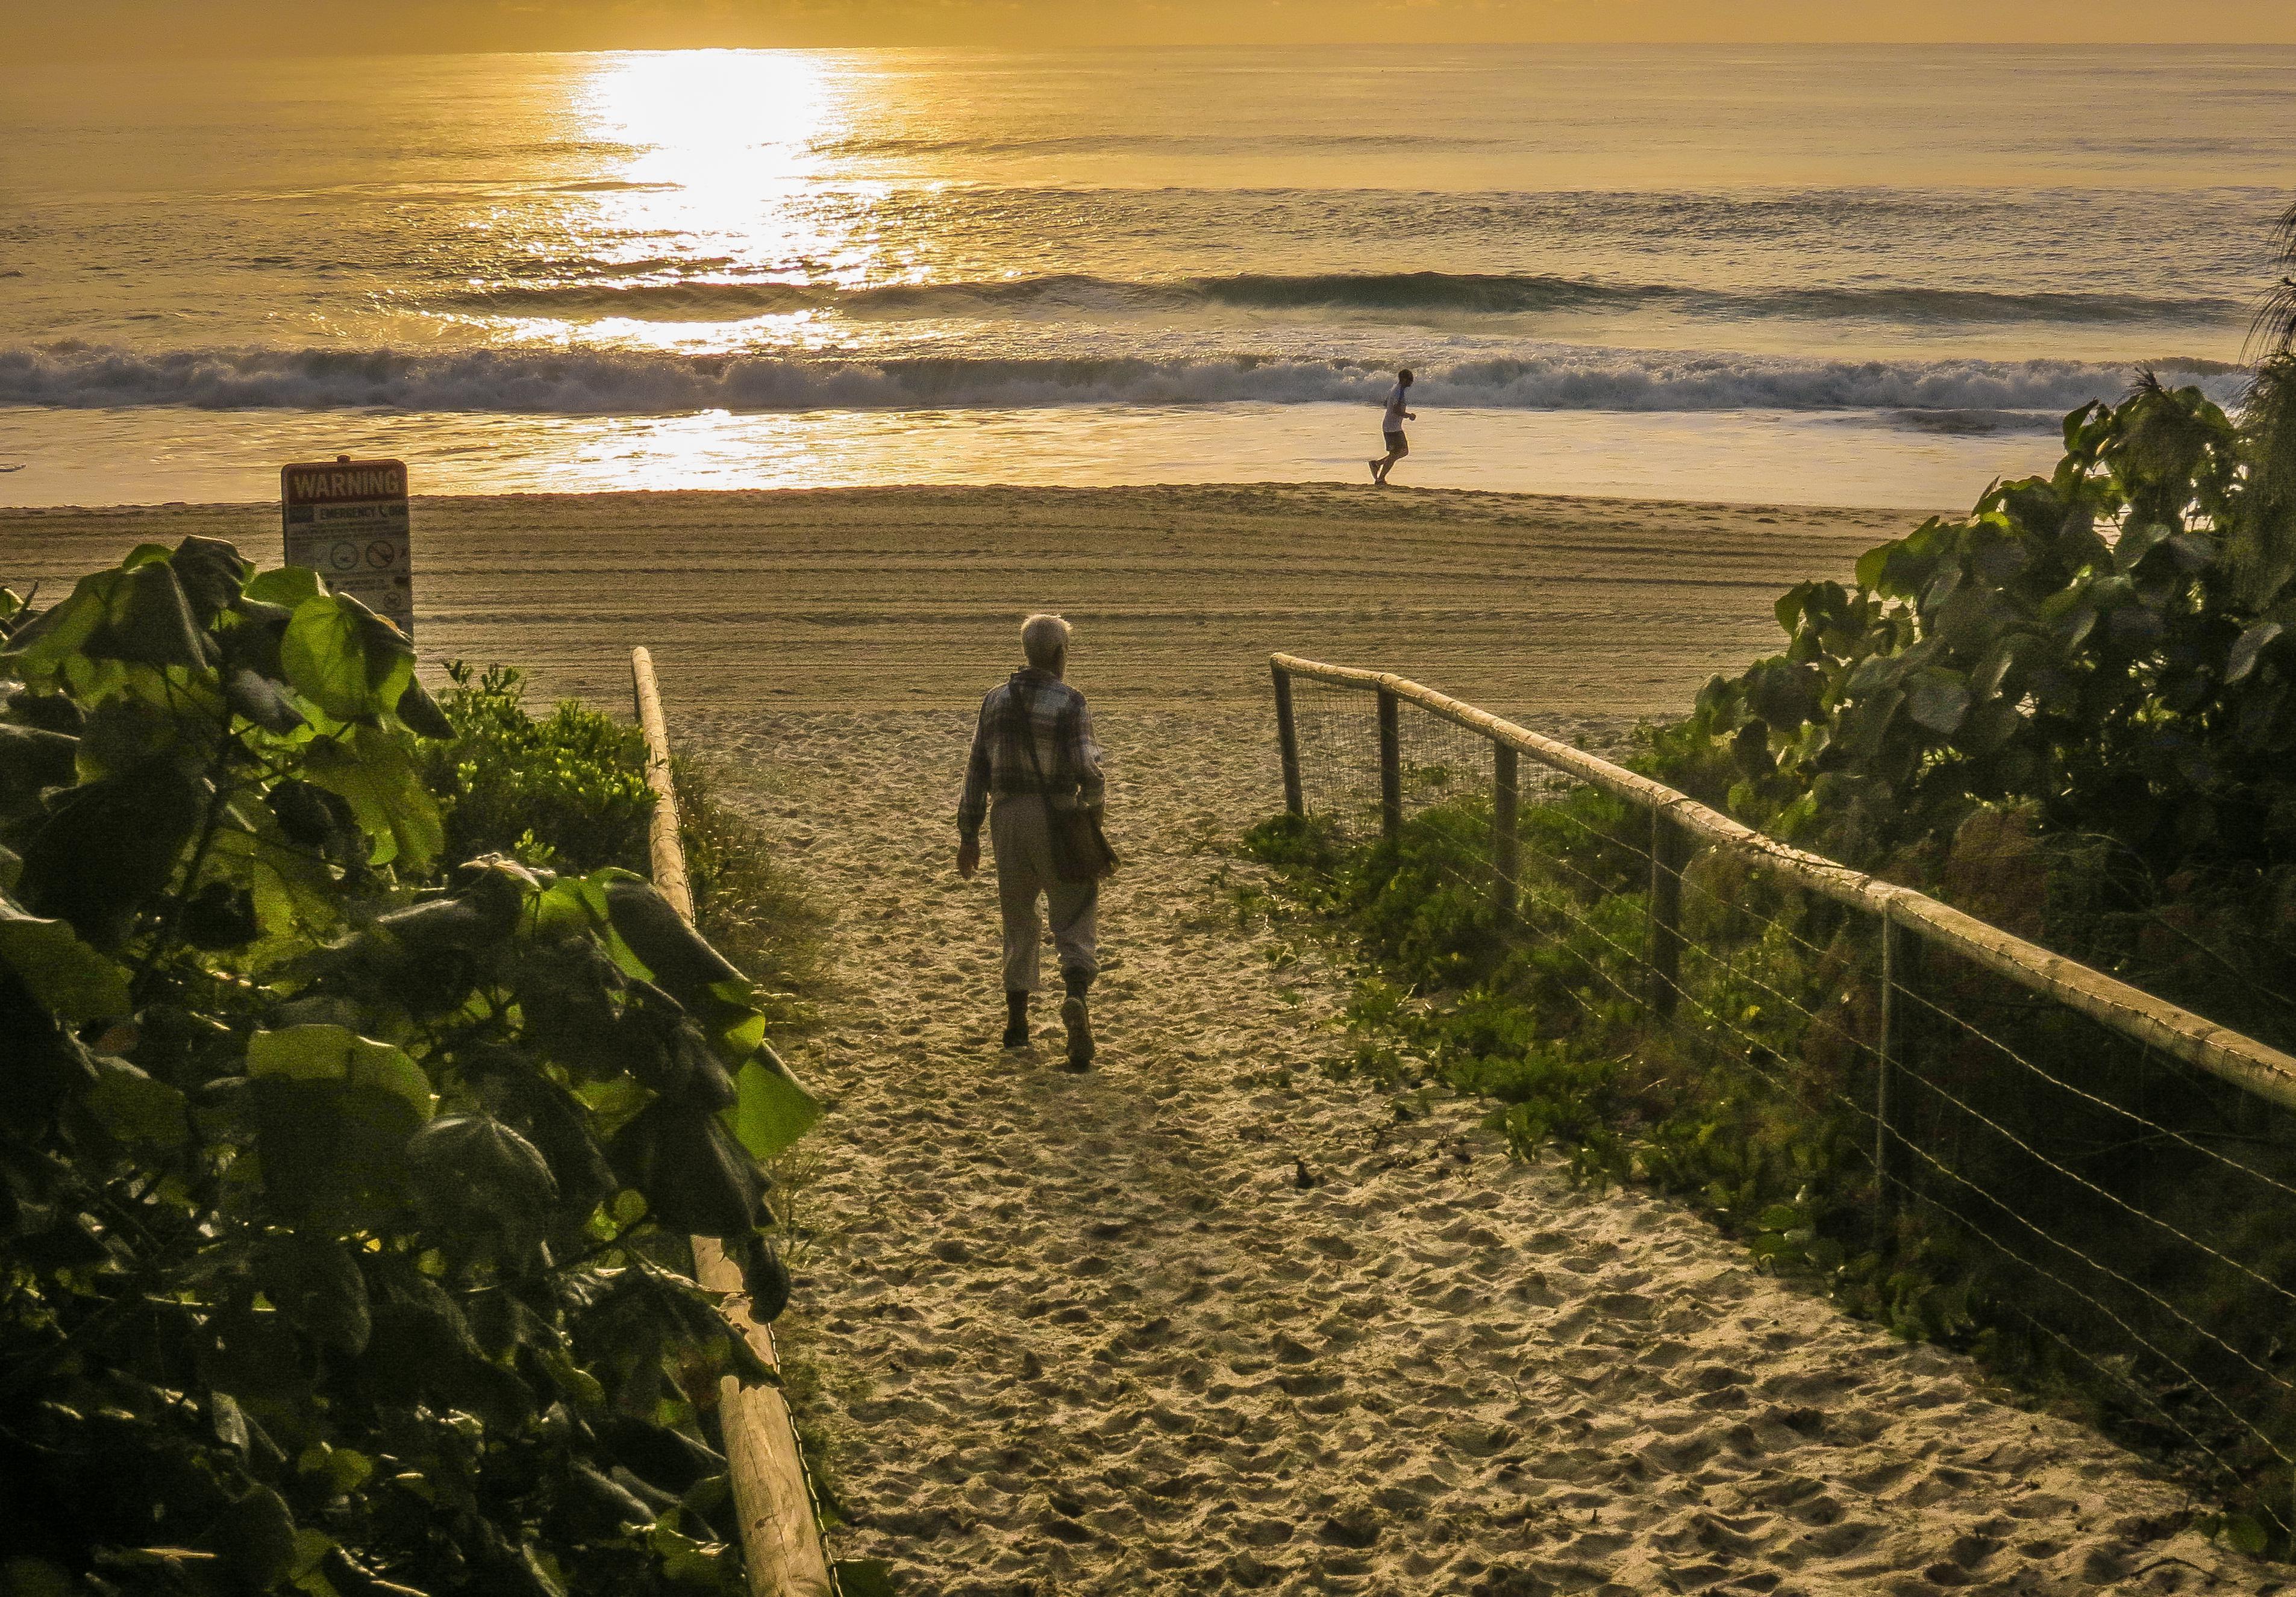 Burleigh Beach morning walk_3811x2651_3811x2651